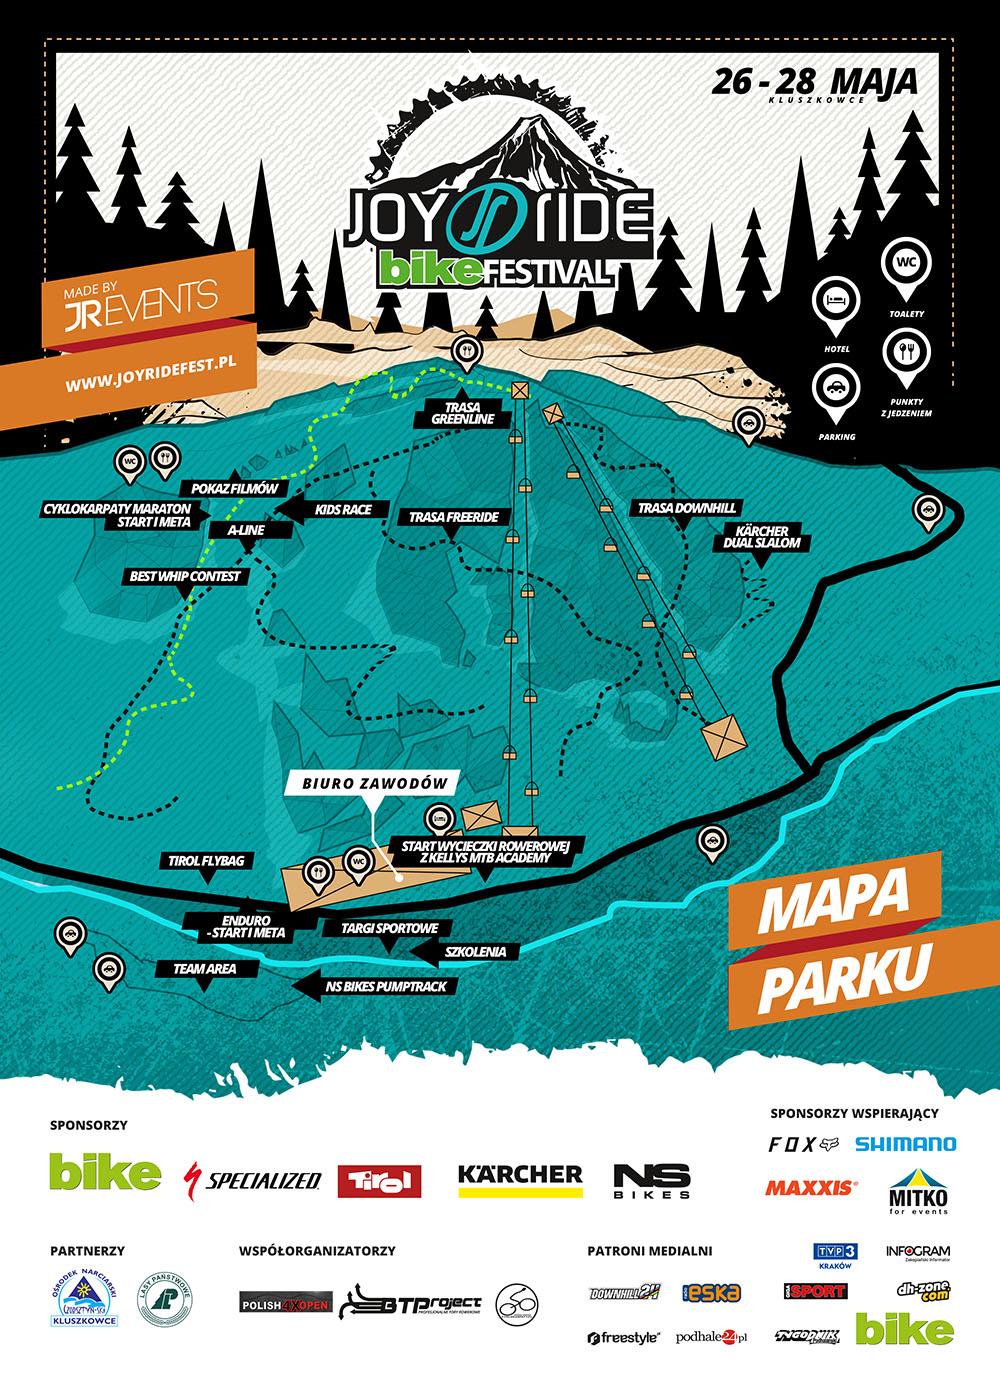 mapa_parku